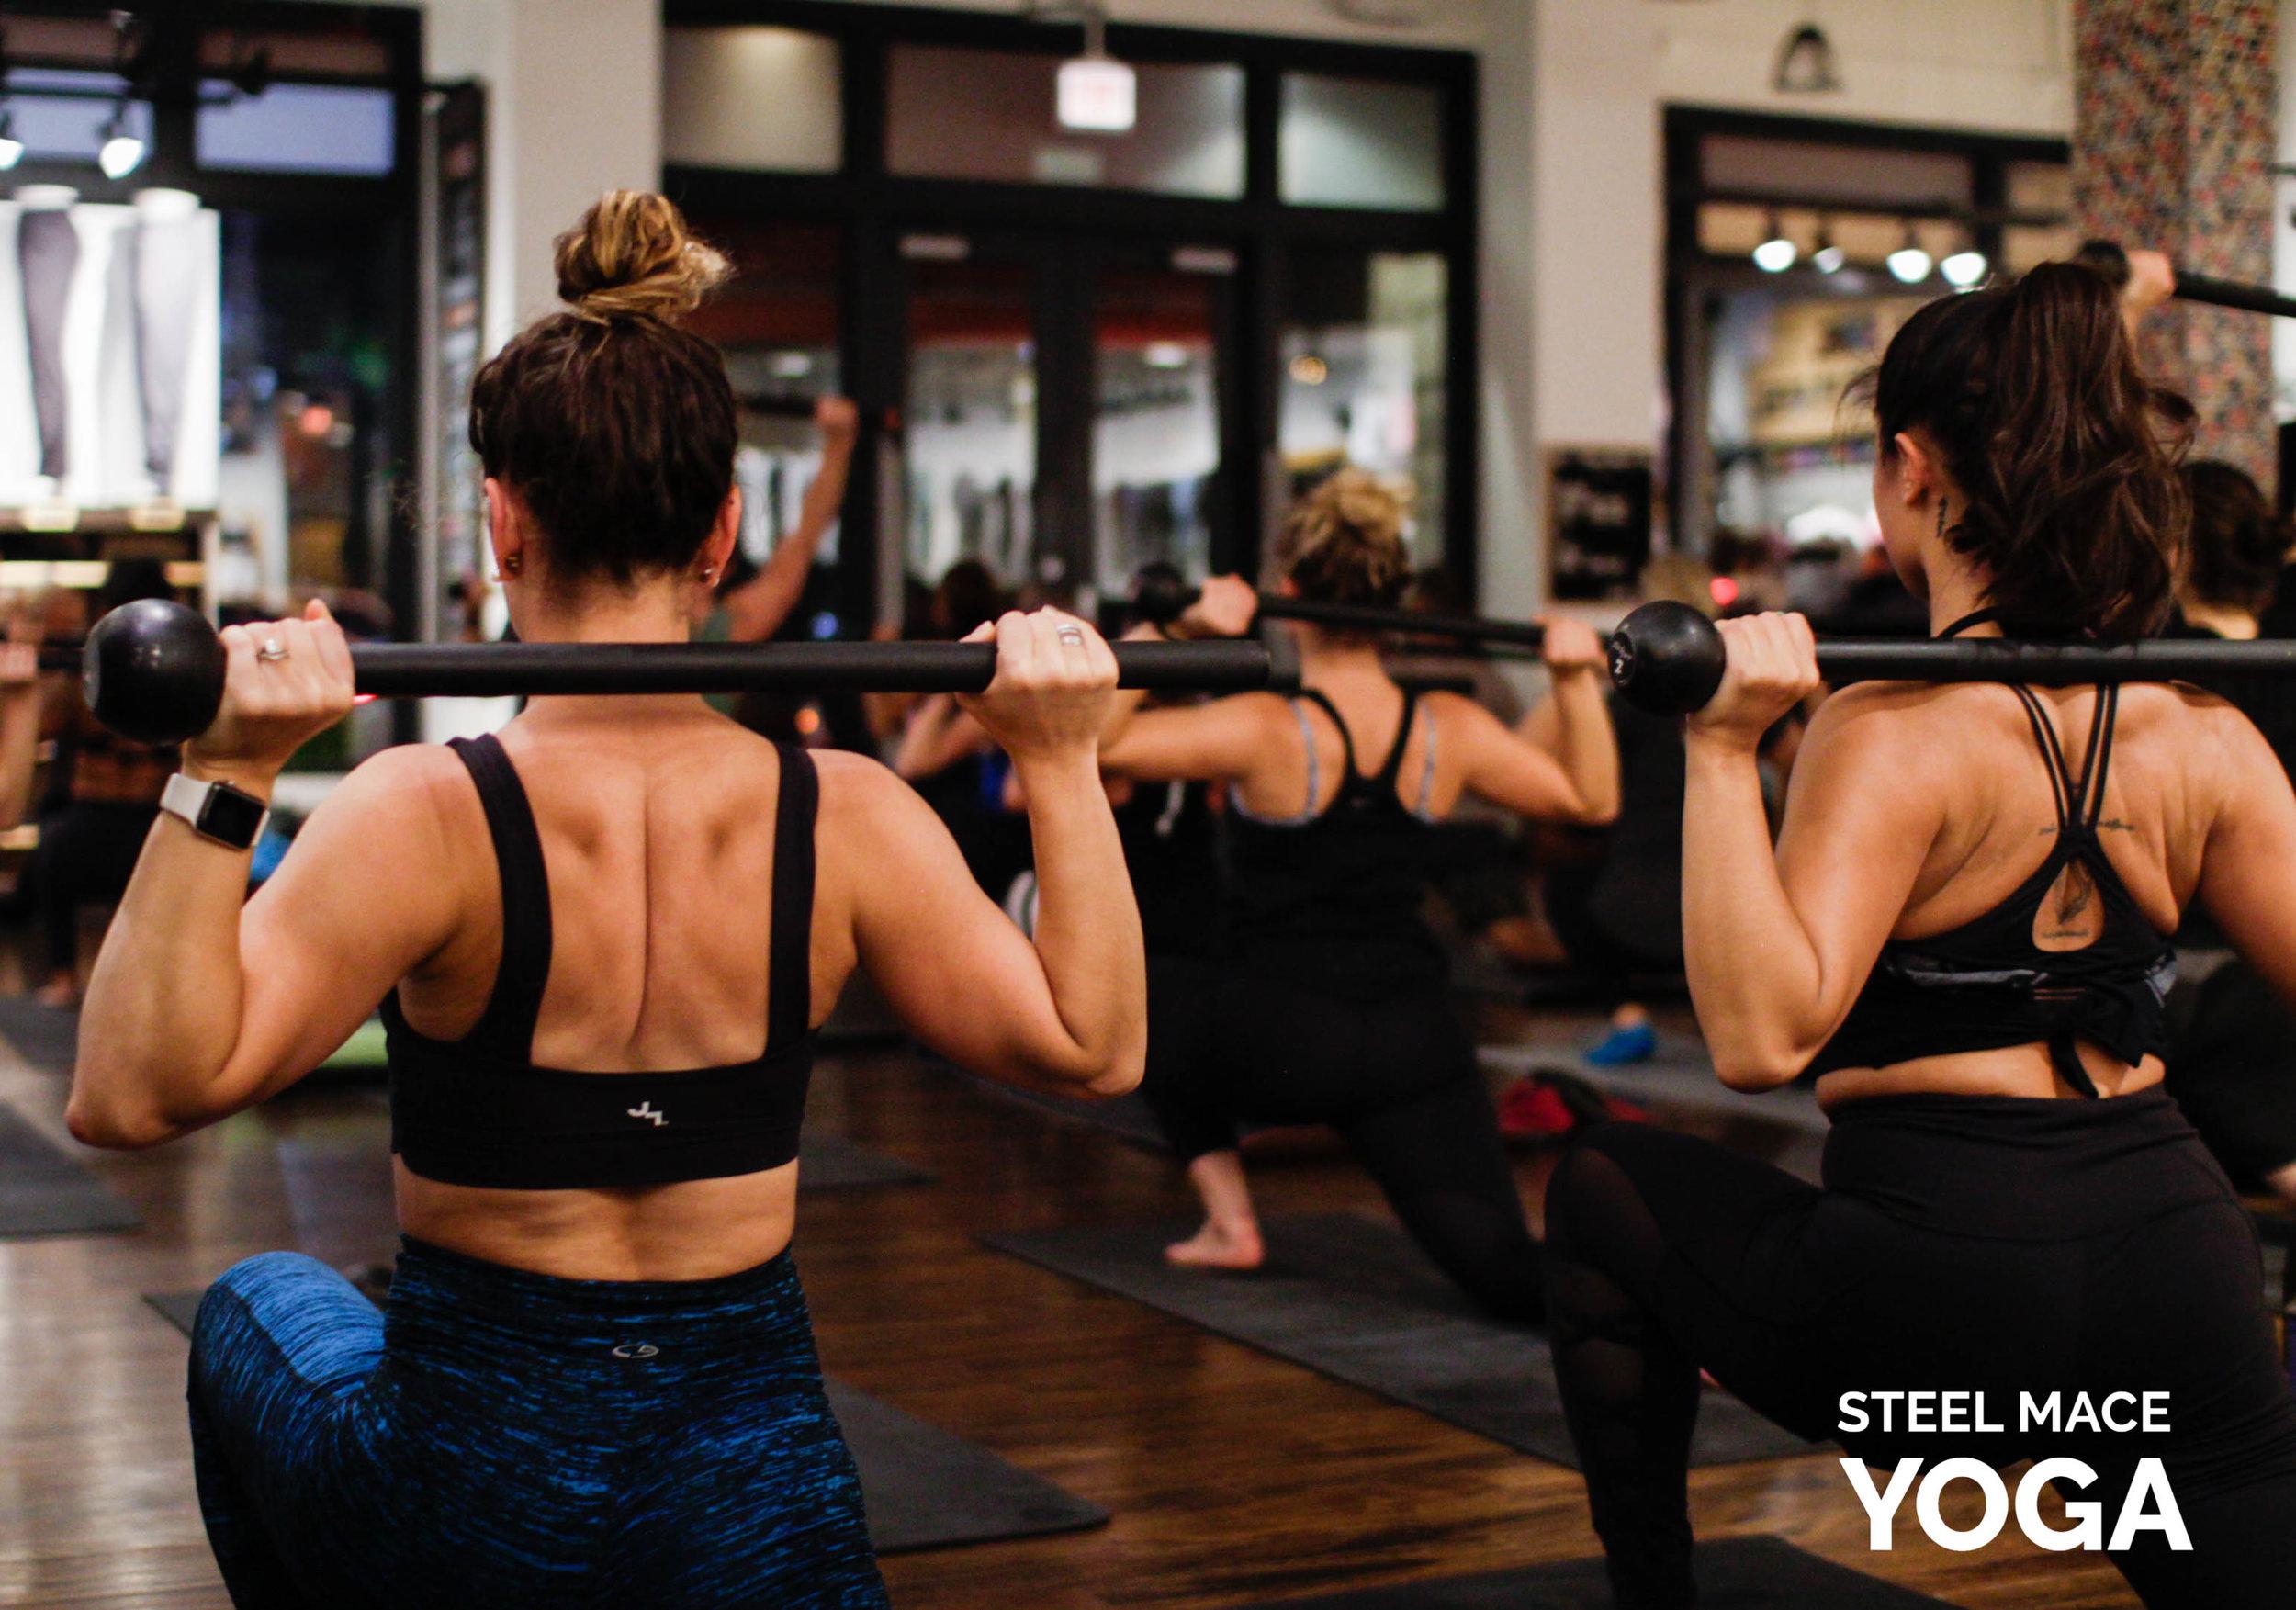 Steel-Mace-Yoga-lululemon-Chicago